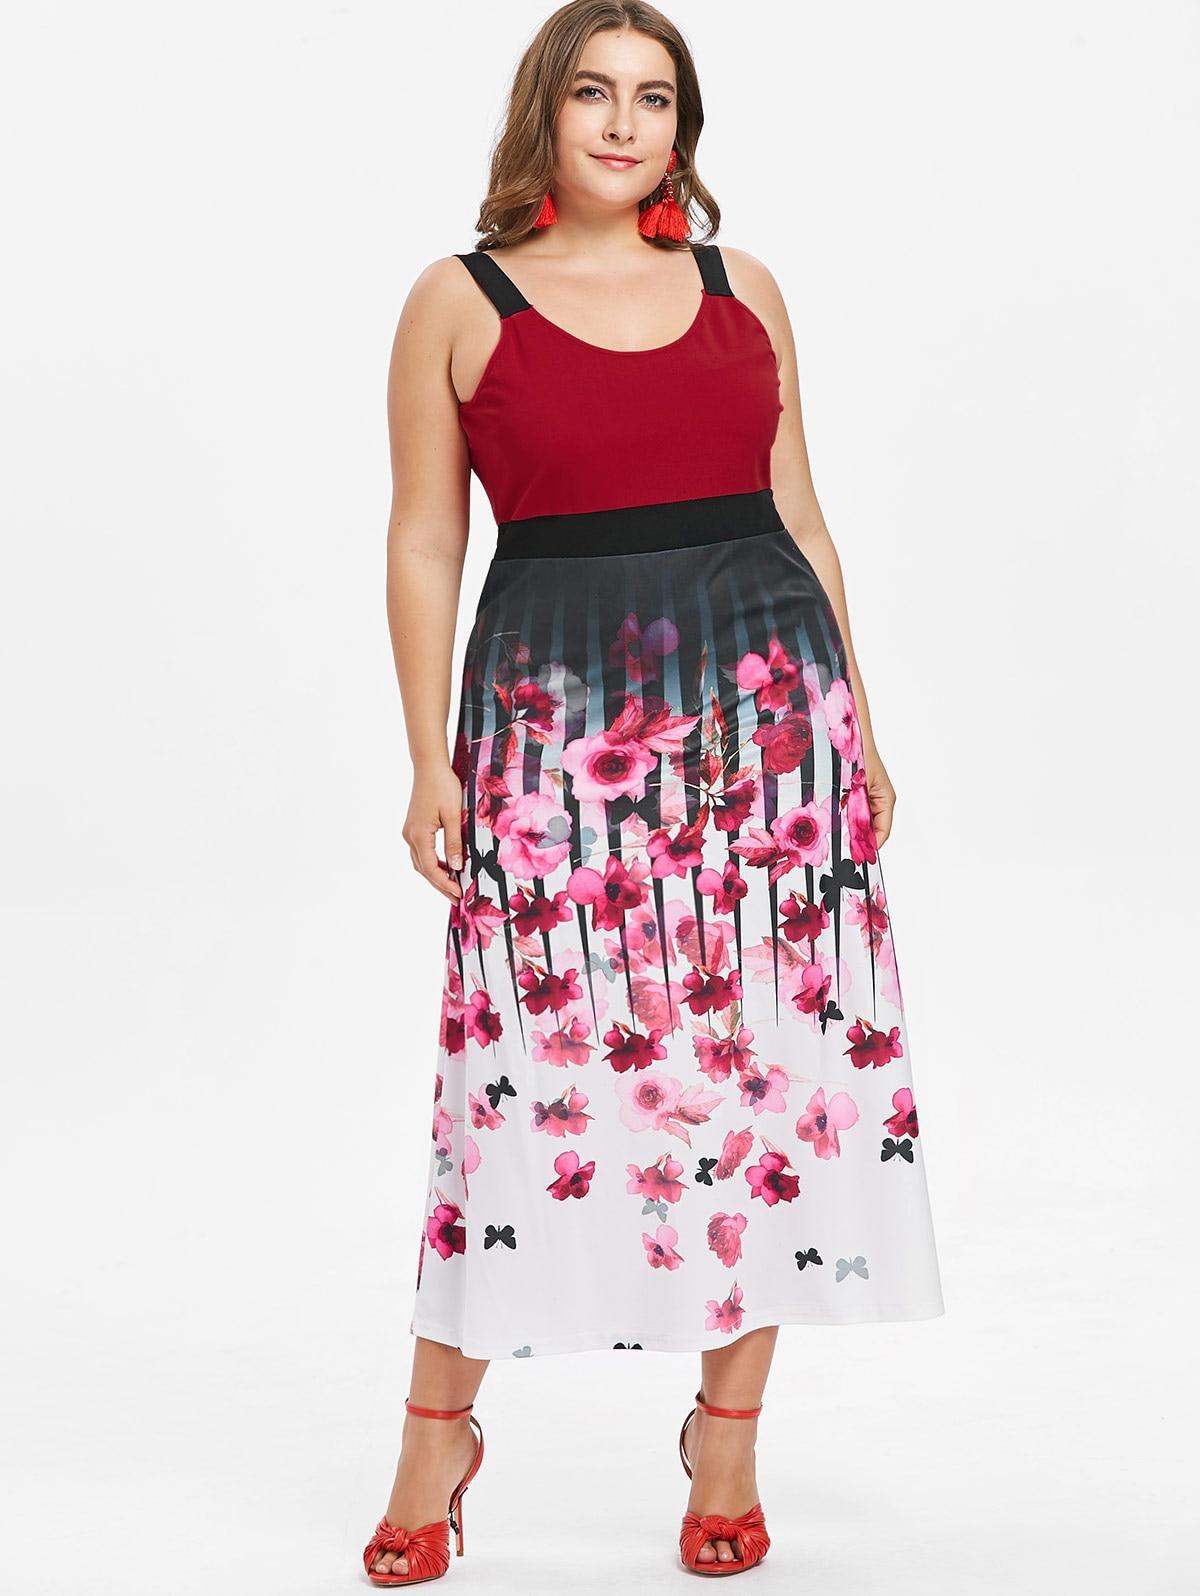 US $14.89 52% OFF|Wipalo Women Plus Size 5XL Sleeveless Butterfly Floral  Tea Length Dress Summer Scoop Neck Empire Waist Casual Dress Vestidos-in ...